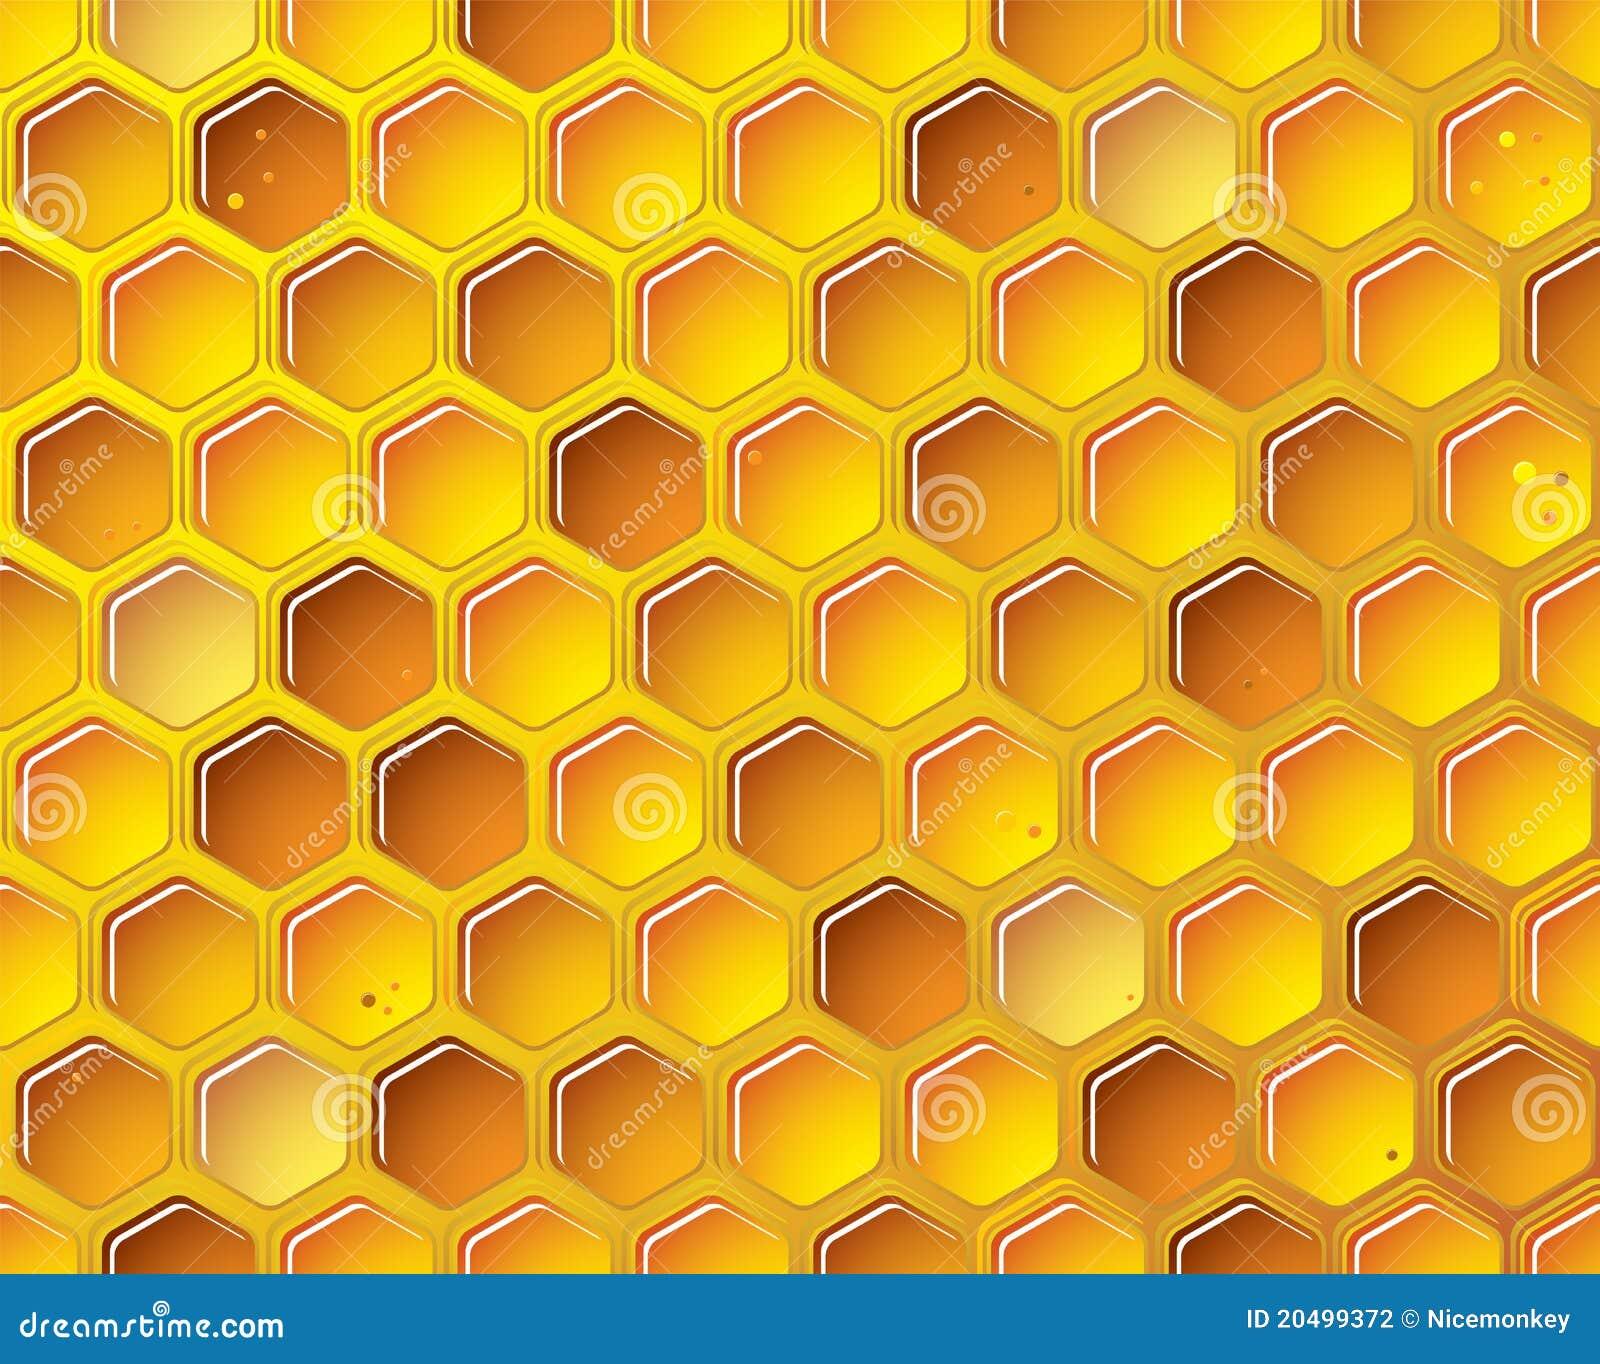 Honeycomb Background Concept Stock Vector